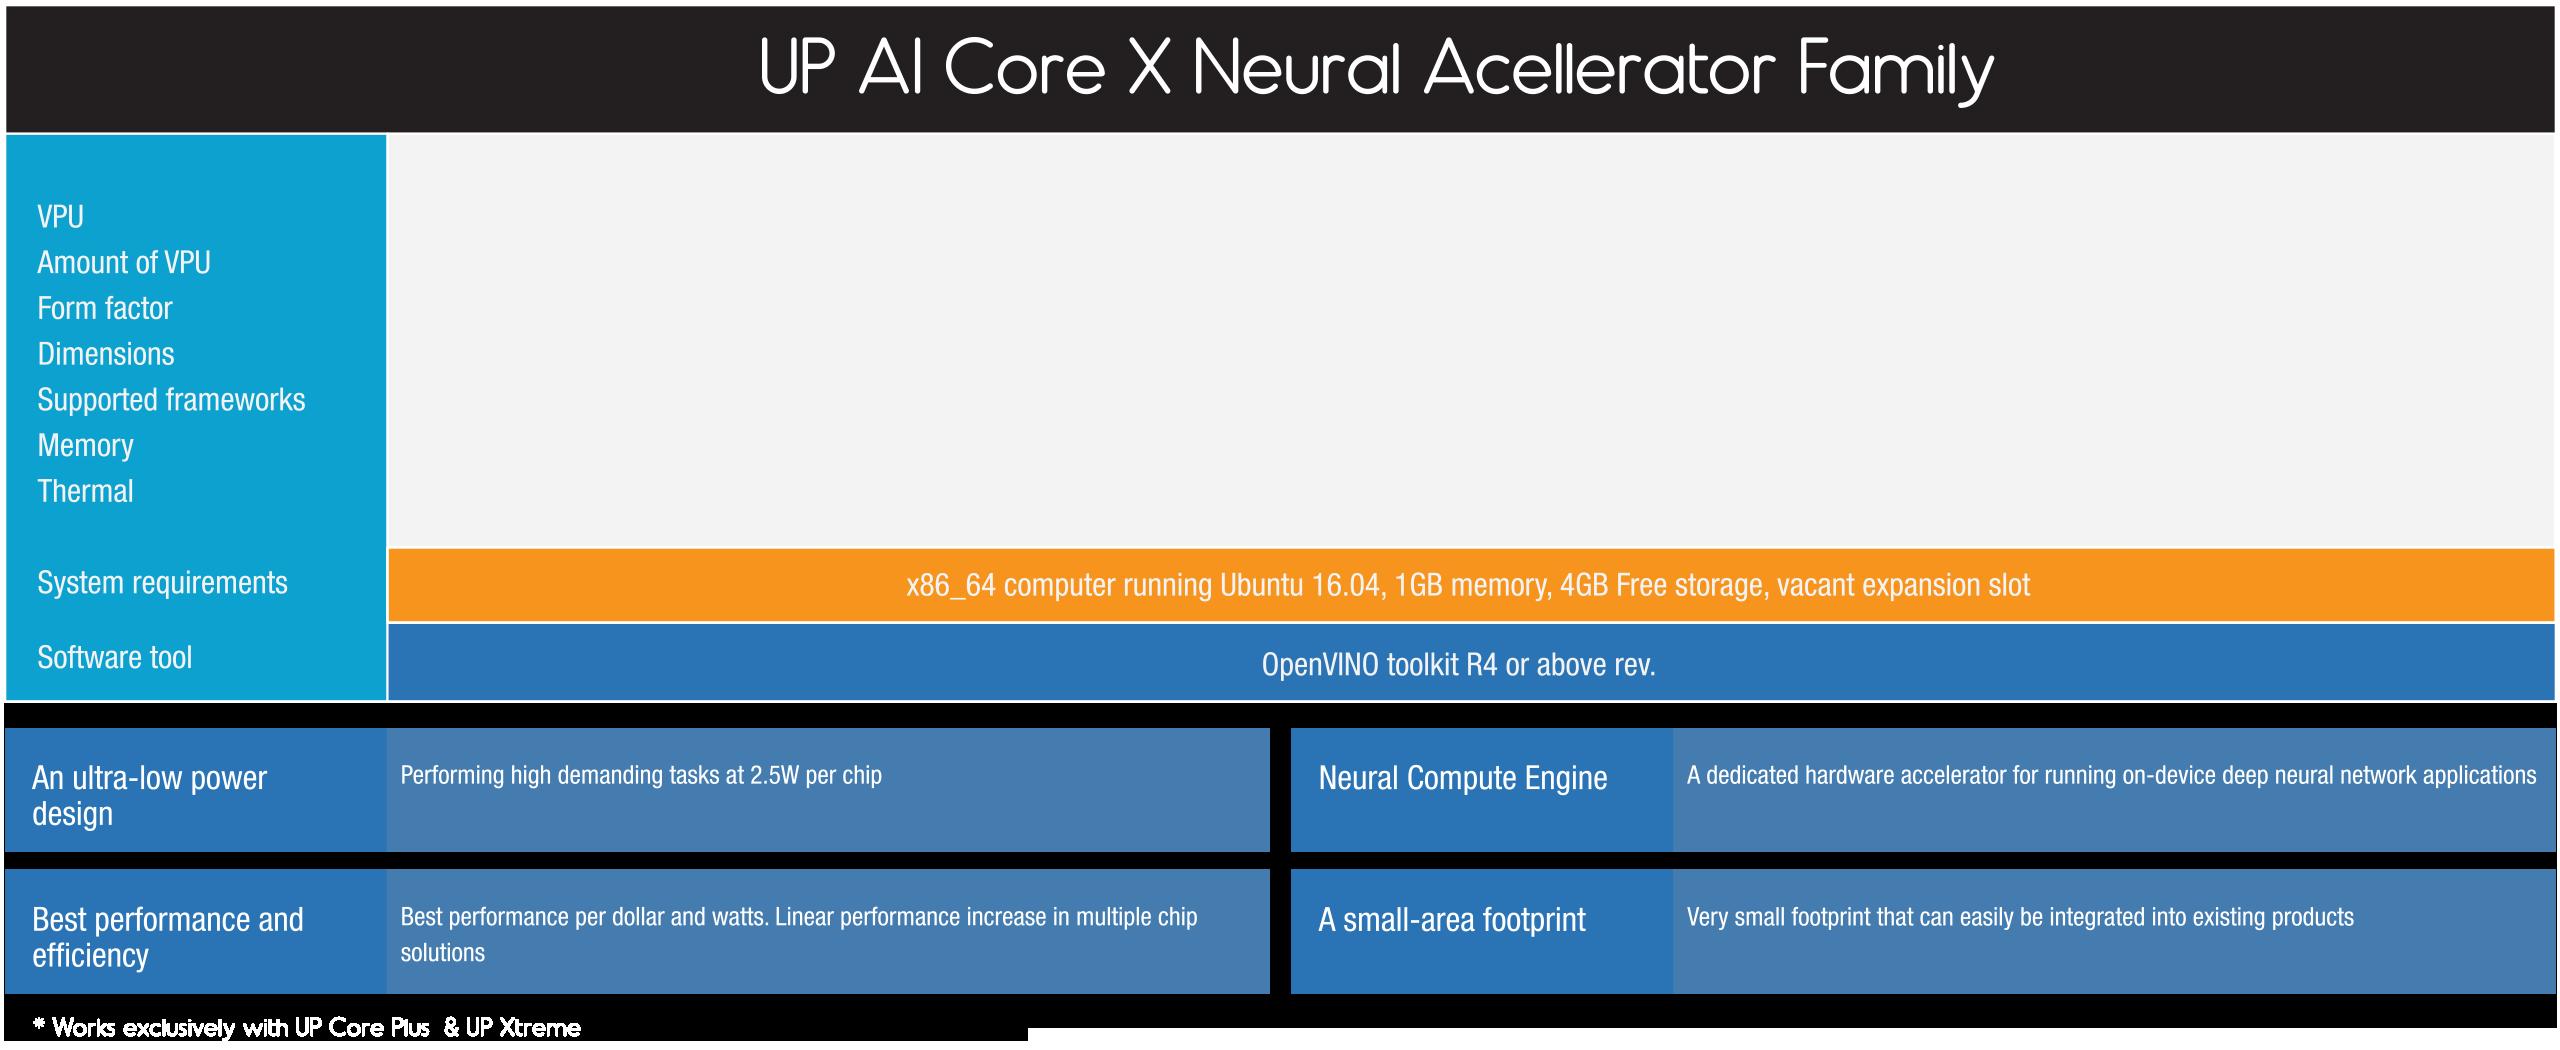 AI Core X – UP Bridge the Gap